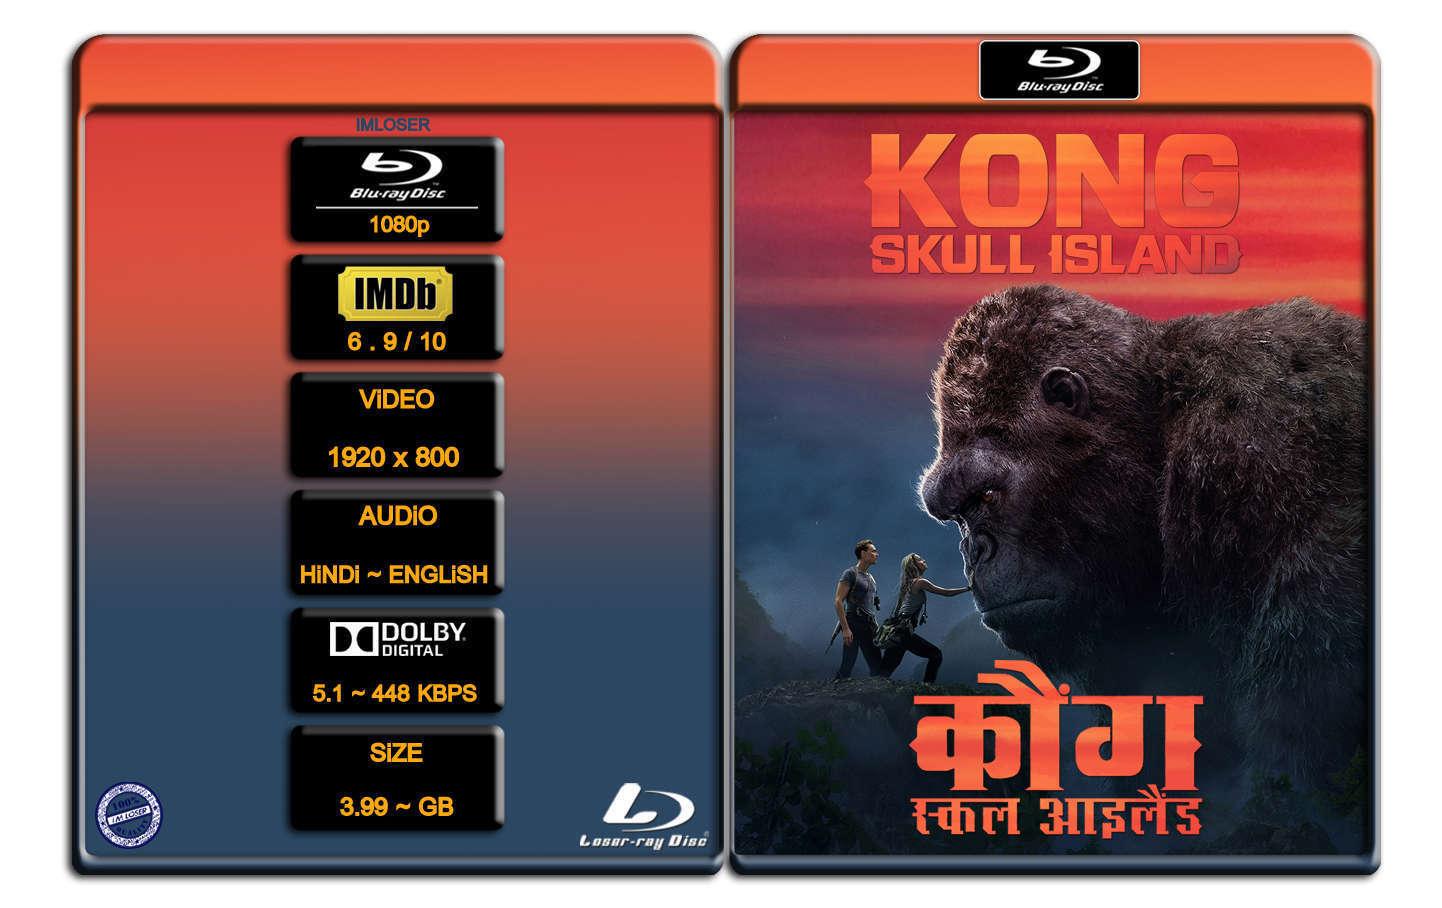 Kong Skull Island [2017] 1080p BluRay x264 [DD 5 1] [HINDI - ENG] ® I'm Loser ®